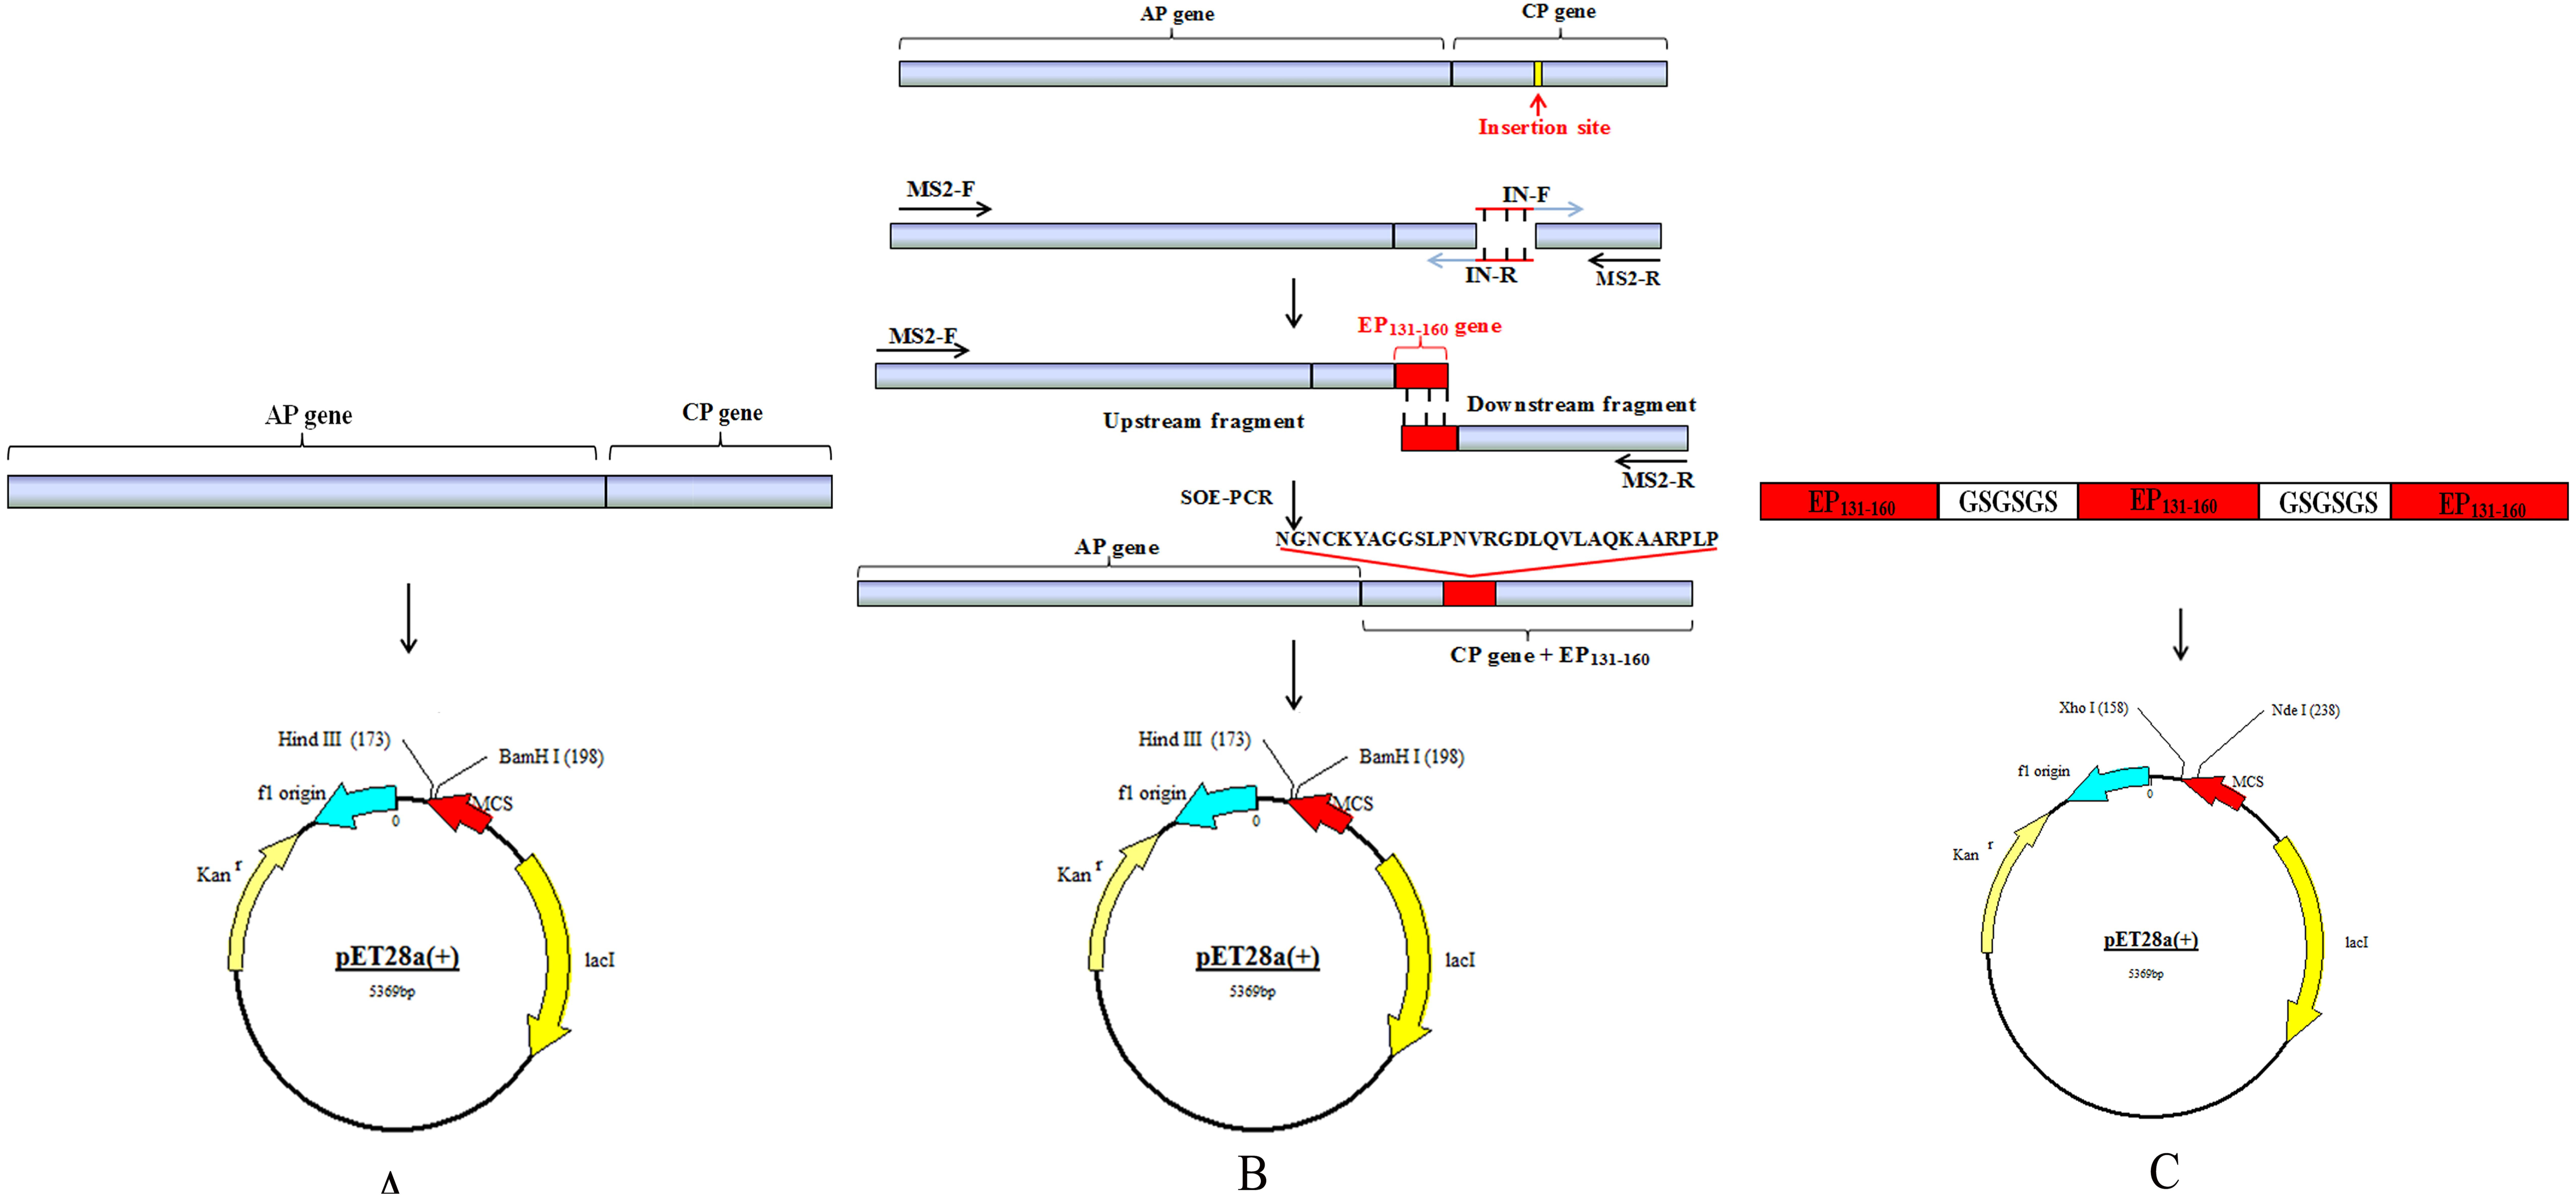 Immunogenicity evaluation of MS2 phage mediated chimeric